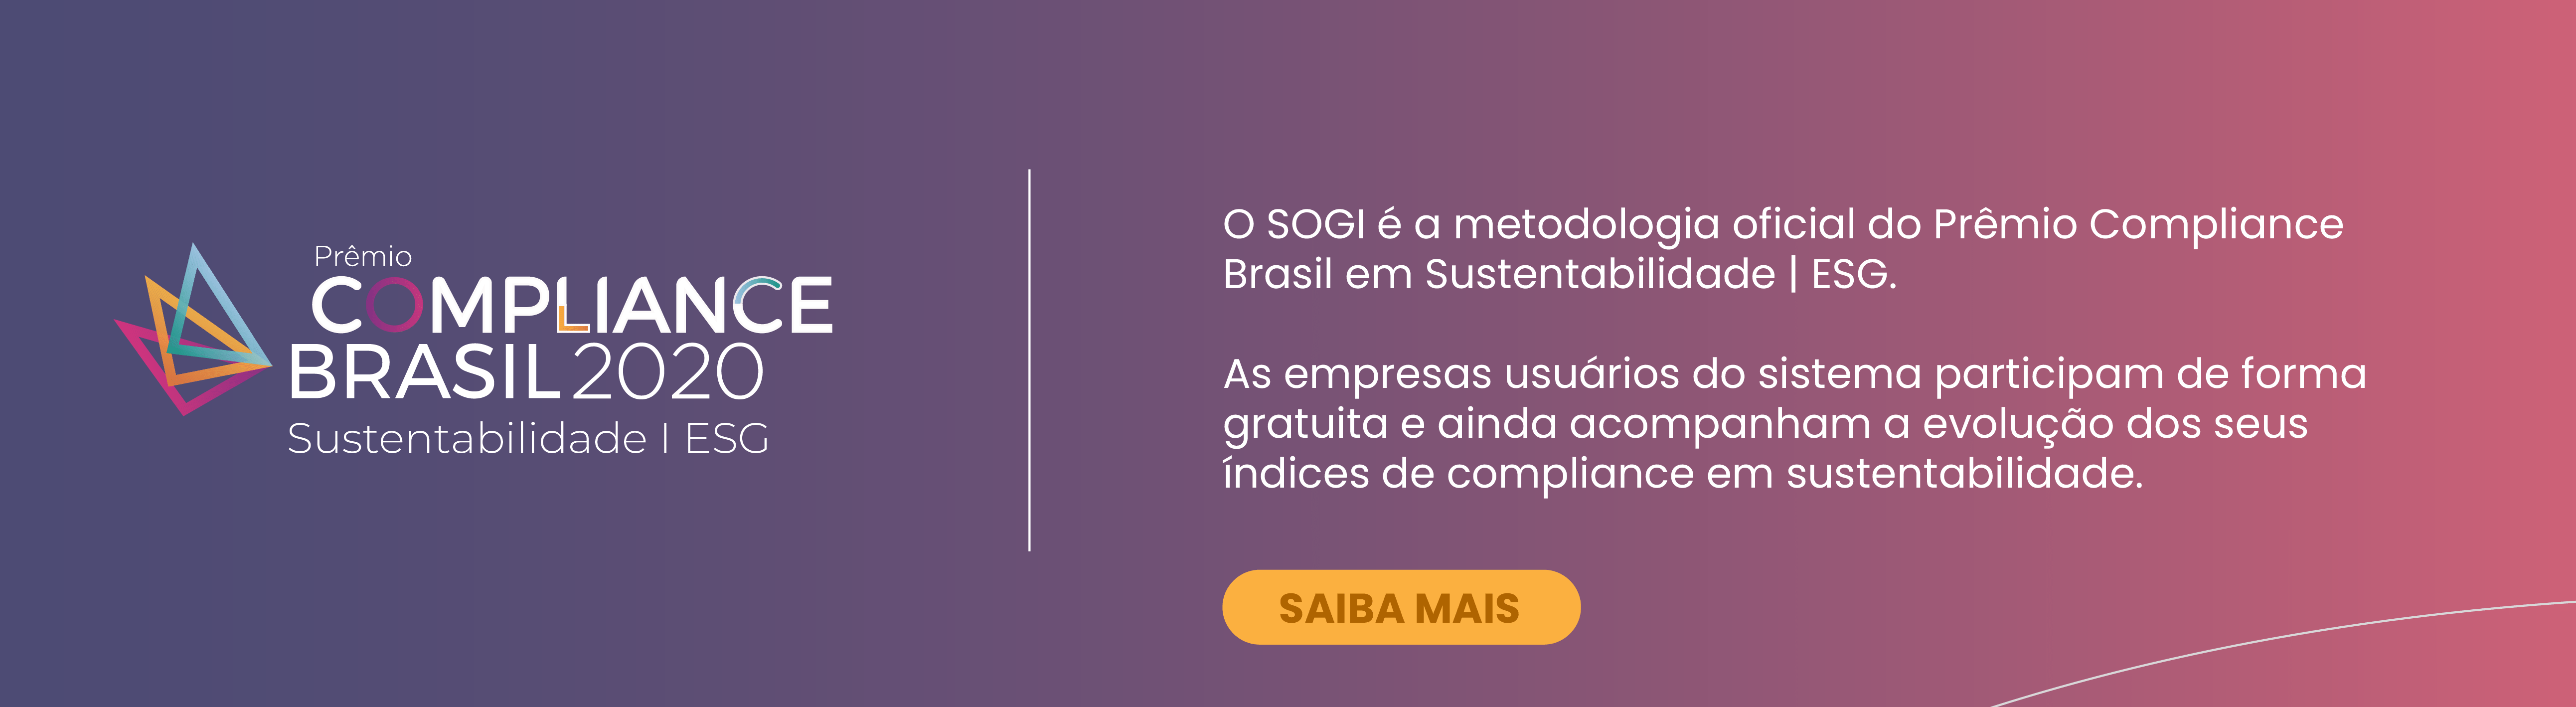 V Prêmio Compliance Brasil 2020